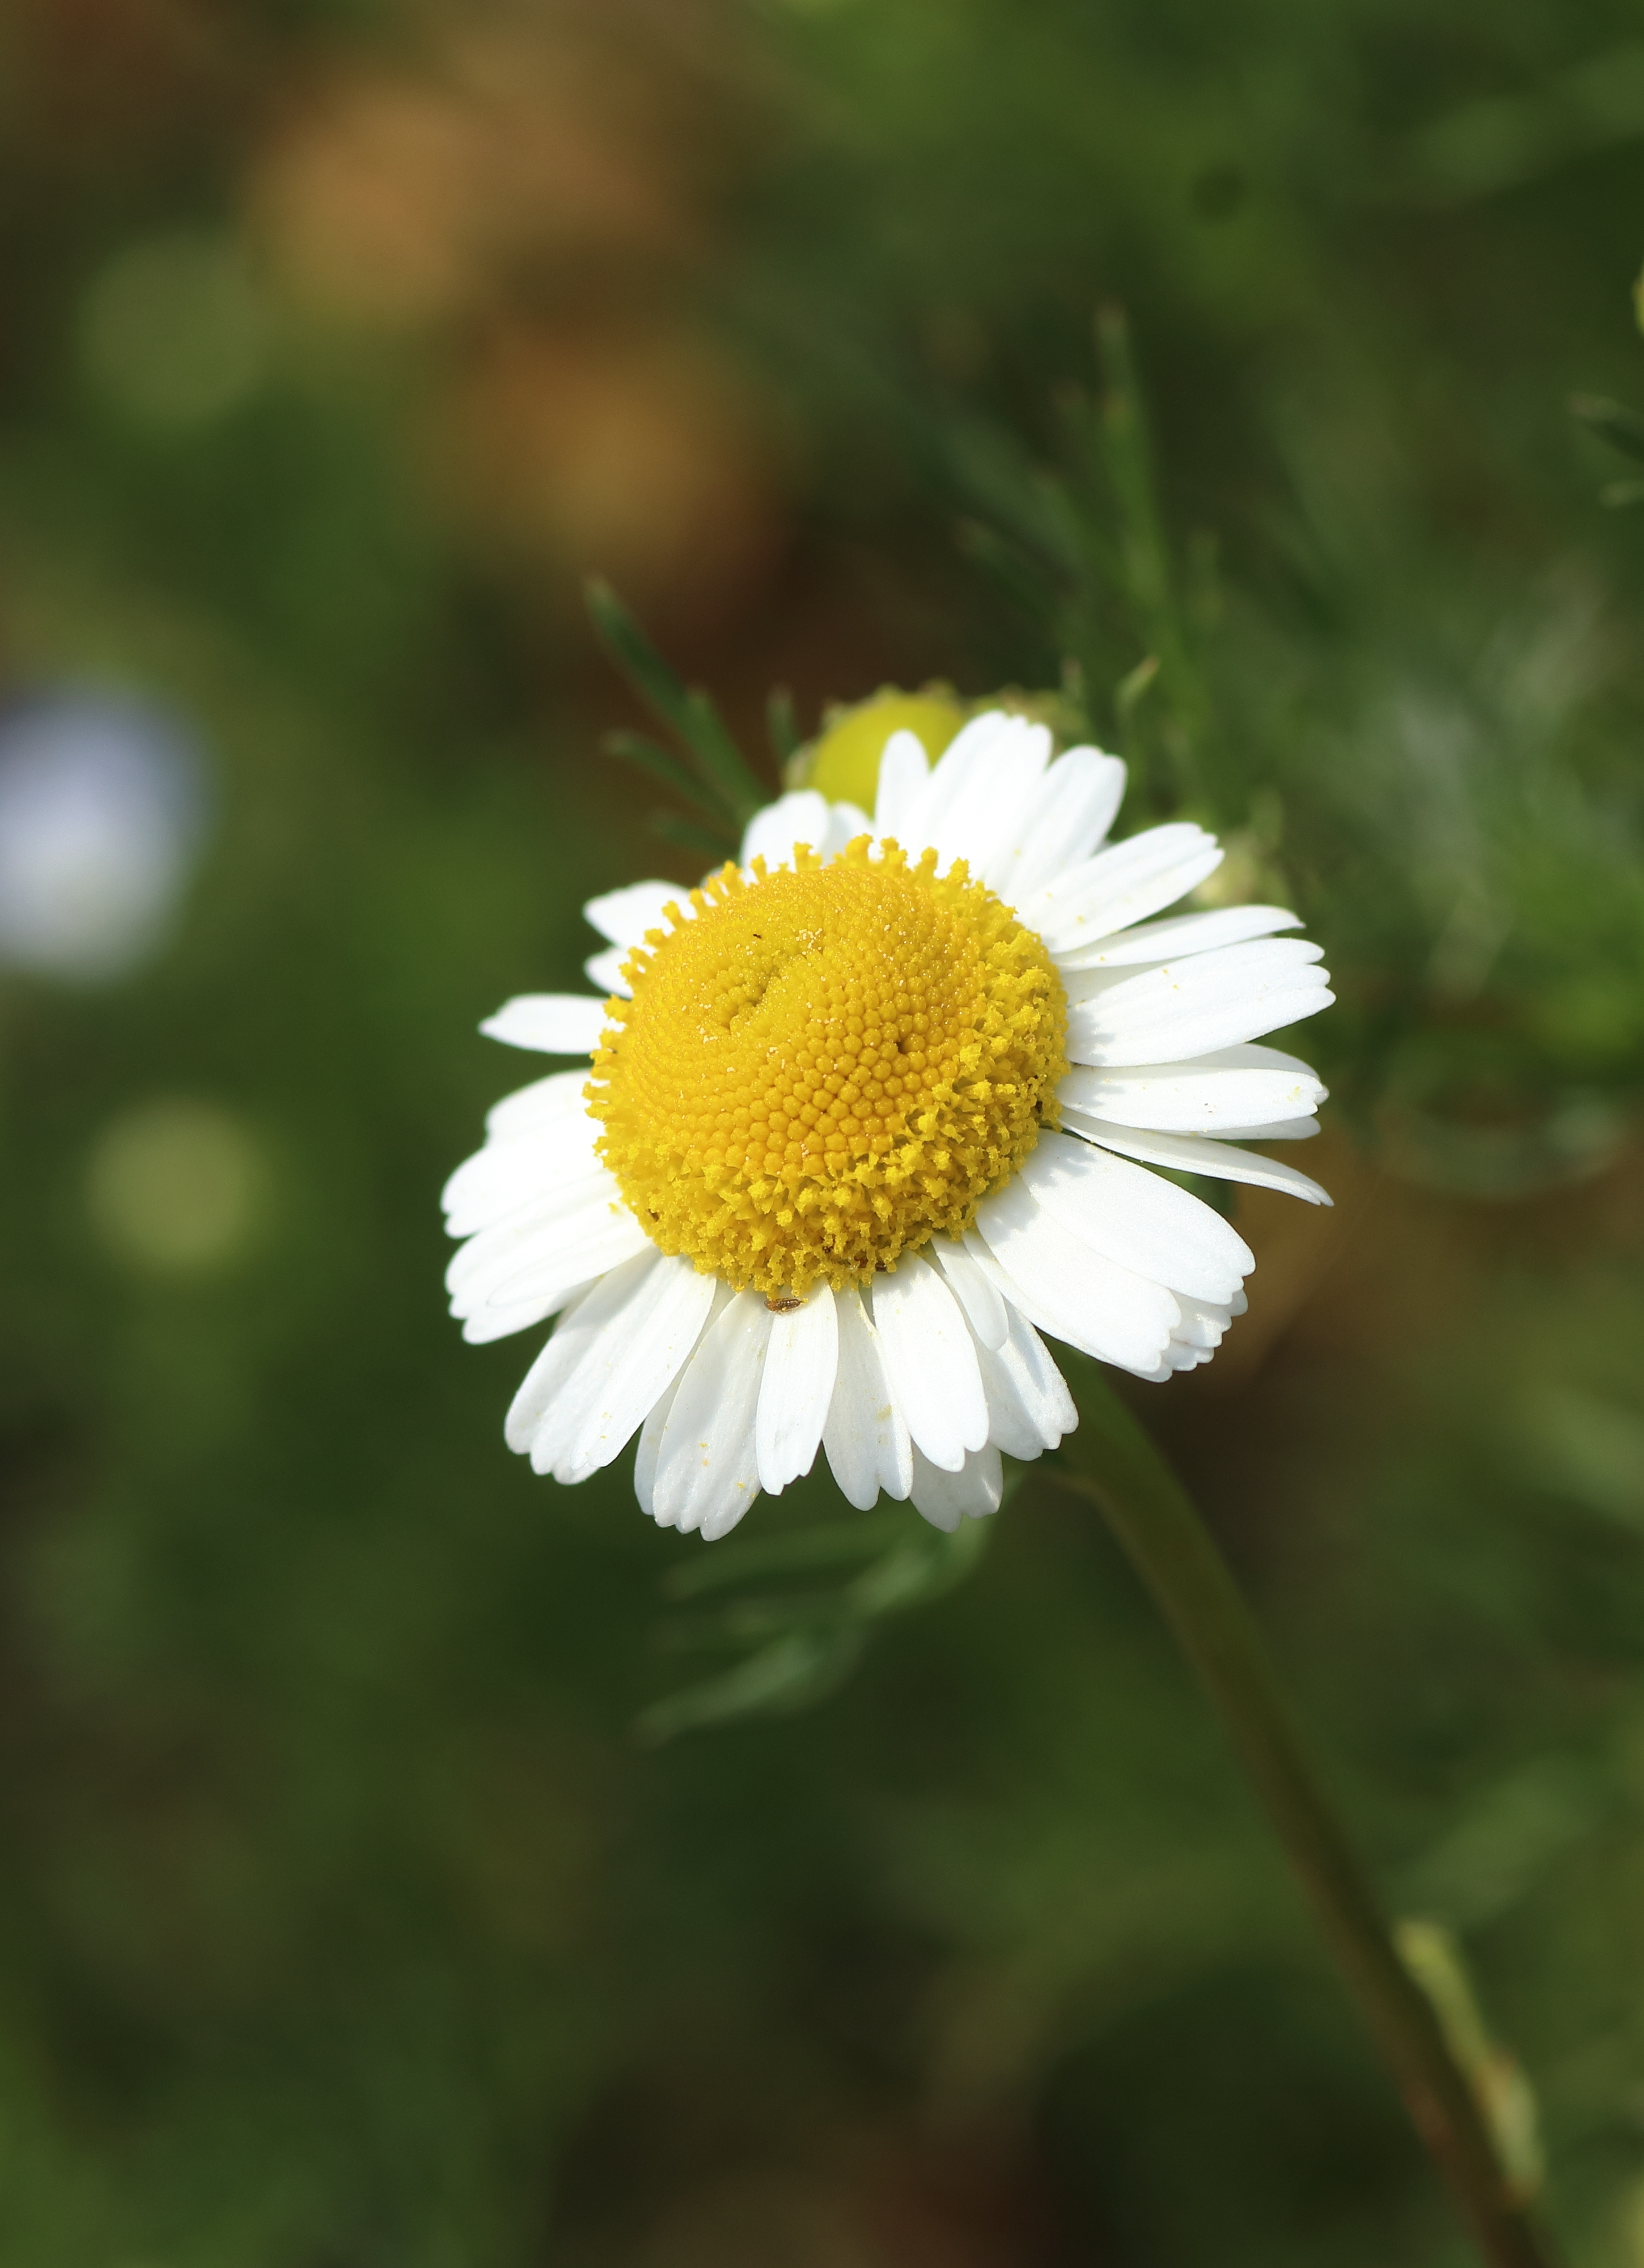 echte Kamille - Blüten